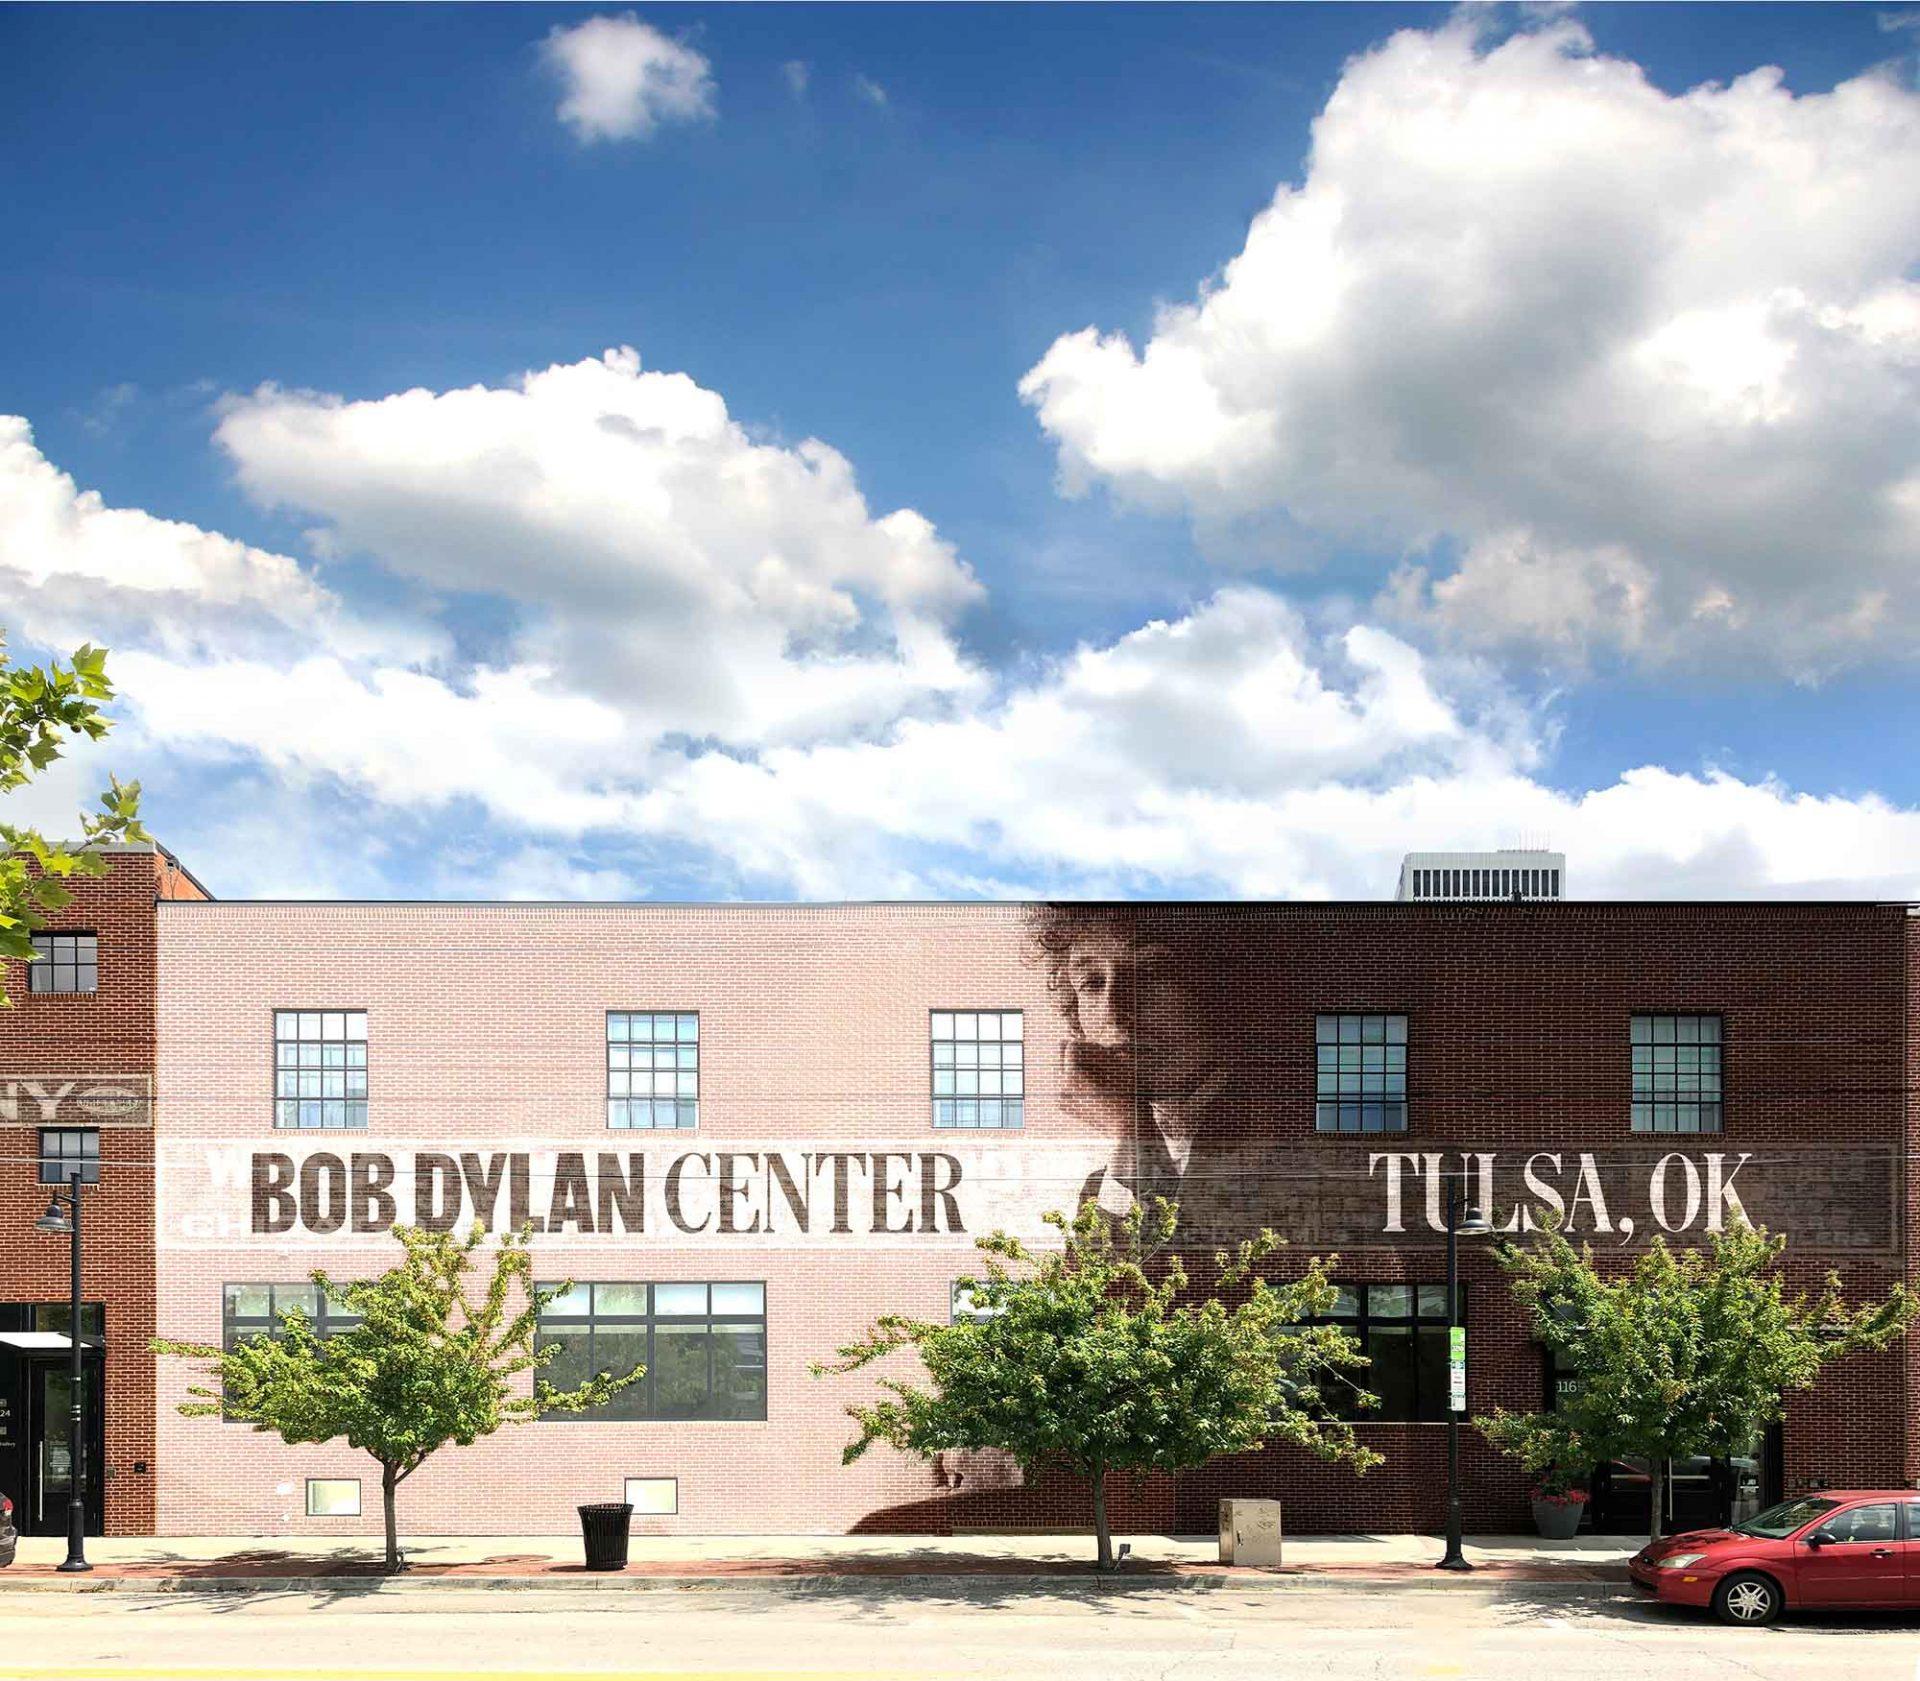 Bob Dylan Center, Tulsa